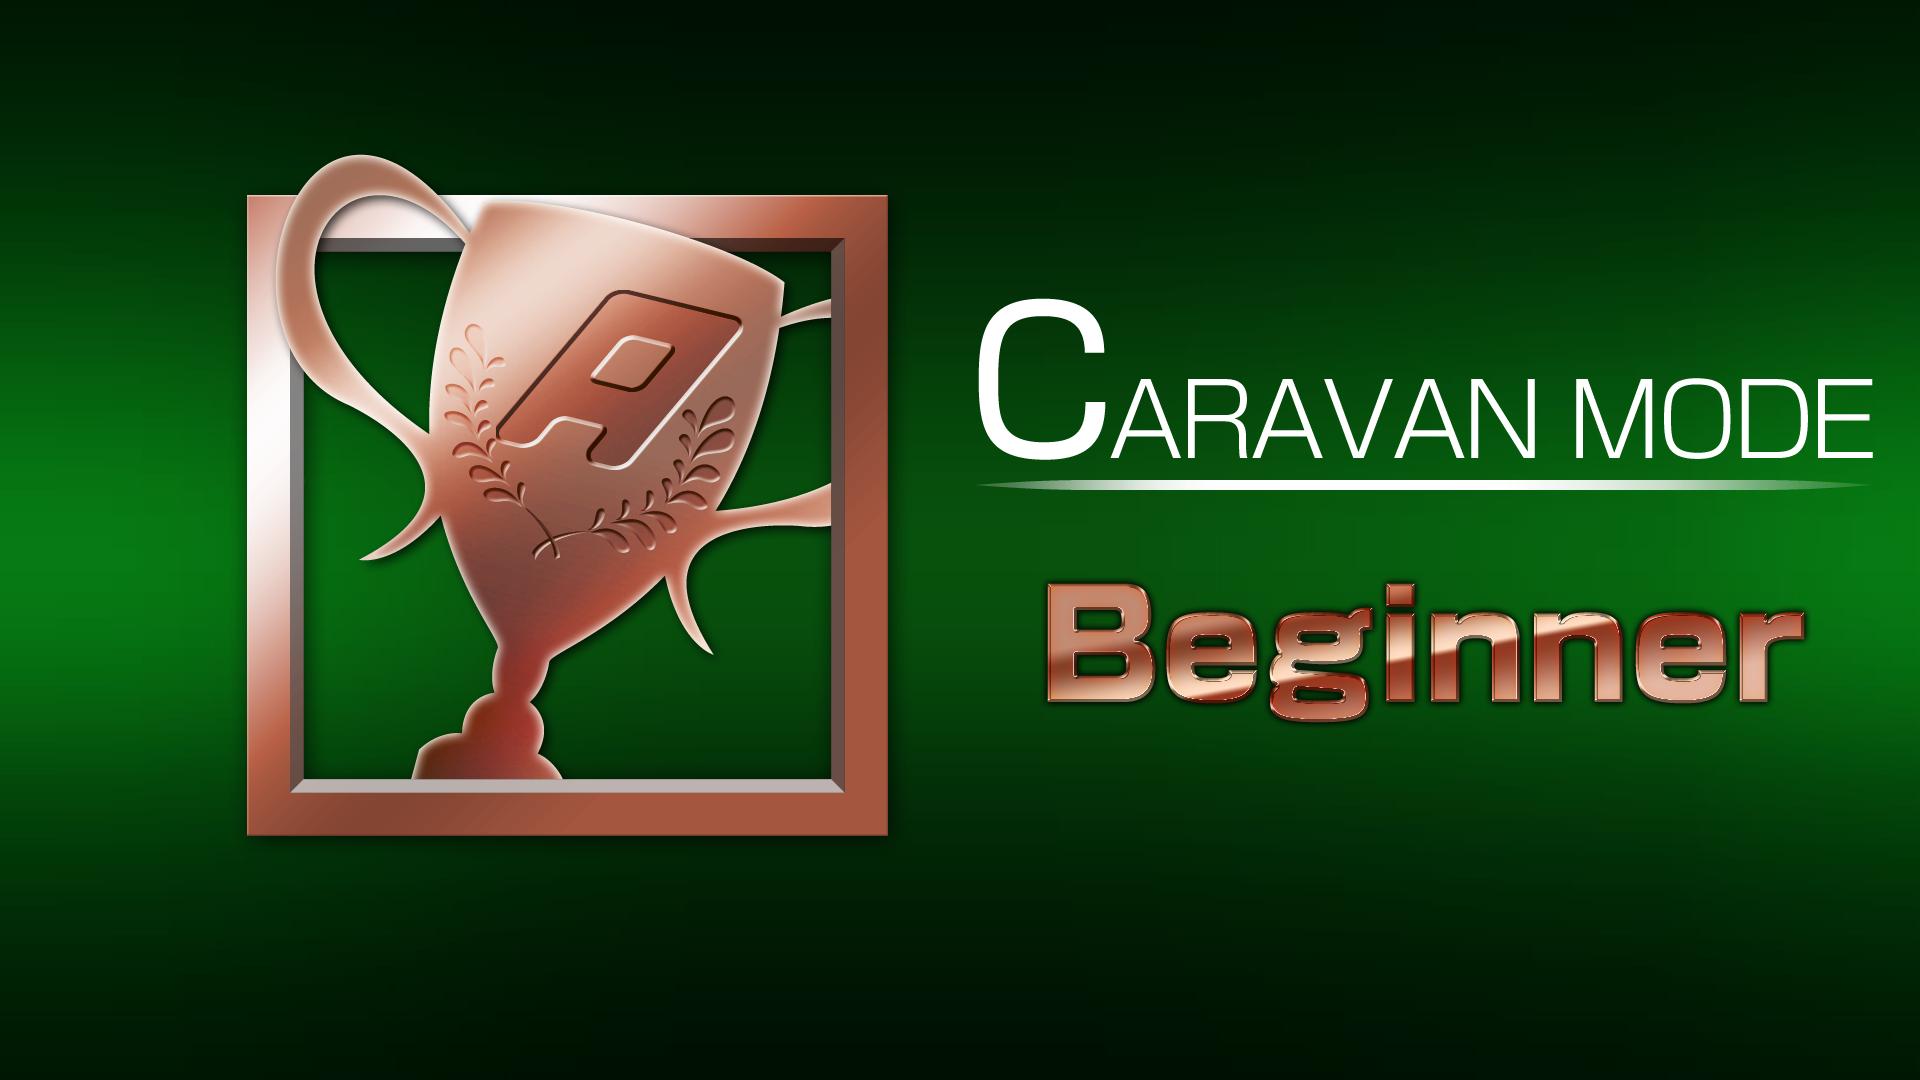 Icon for CARAVAN MODE 10,000 points